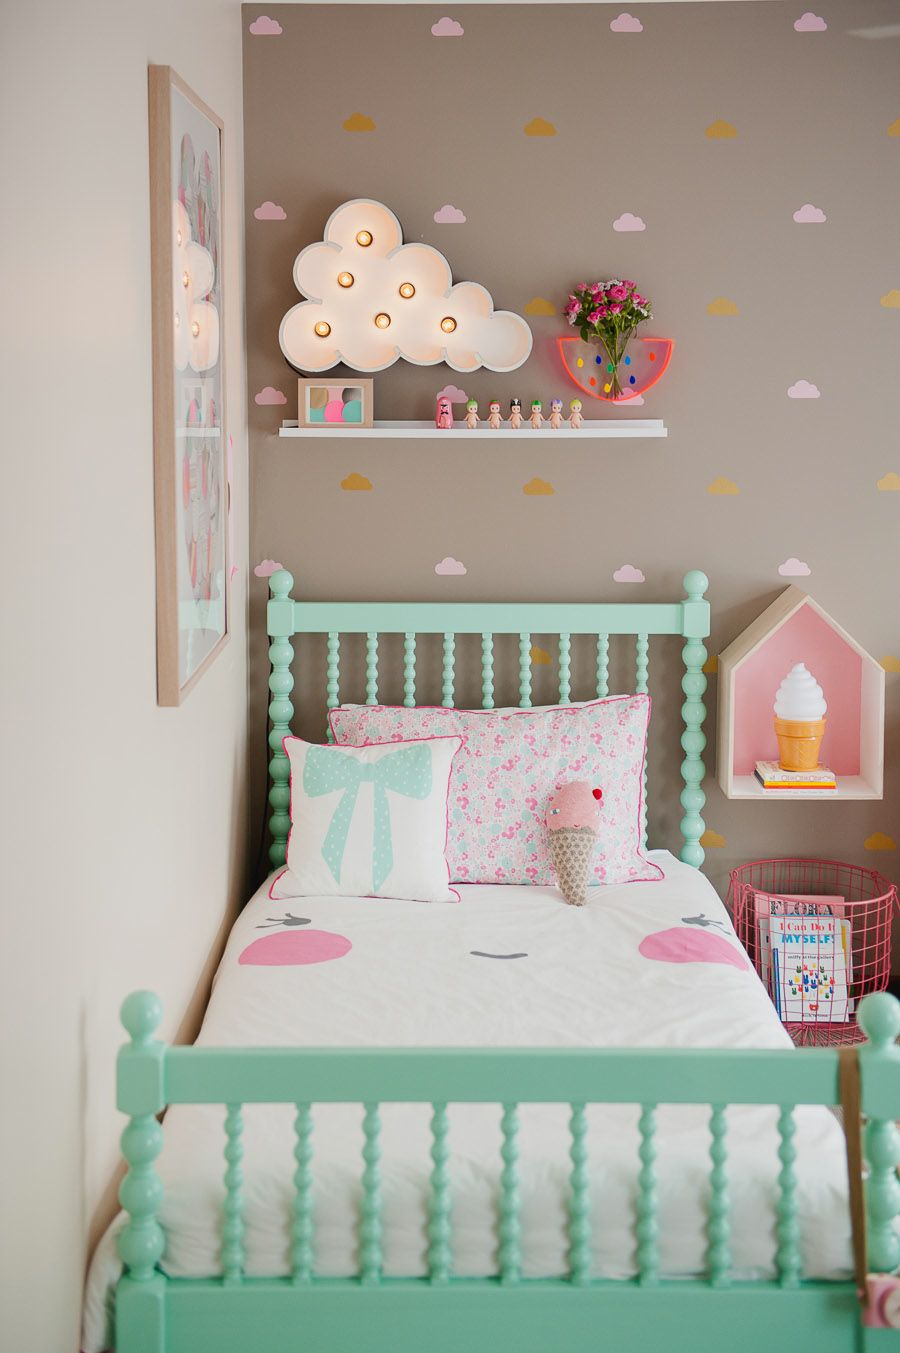 Petite Vintage Interiors X Laura Blythman 4 | Decoracion cuarto ...